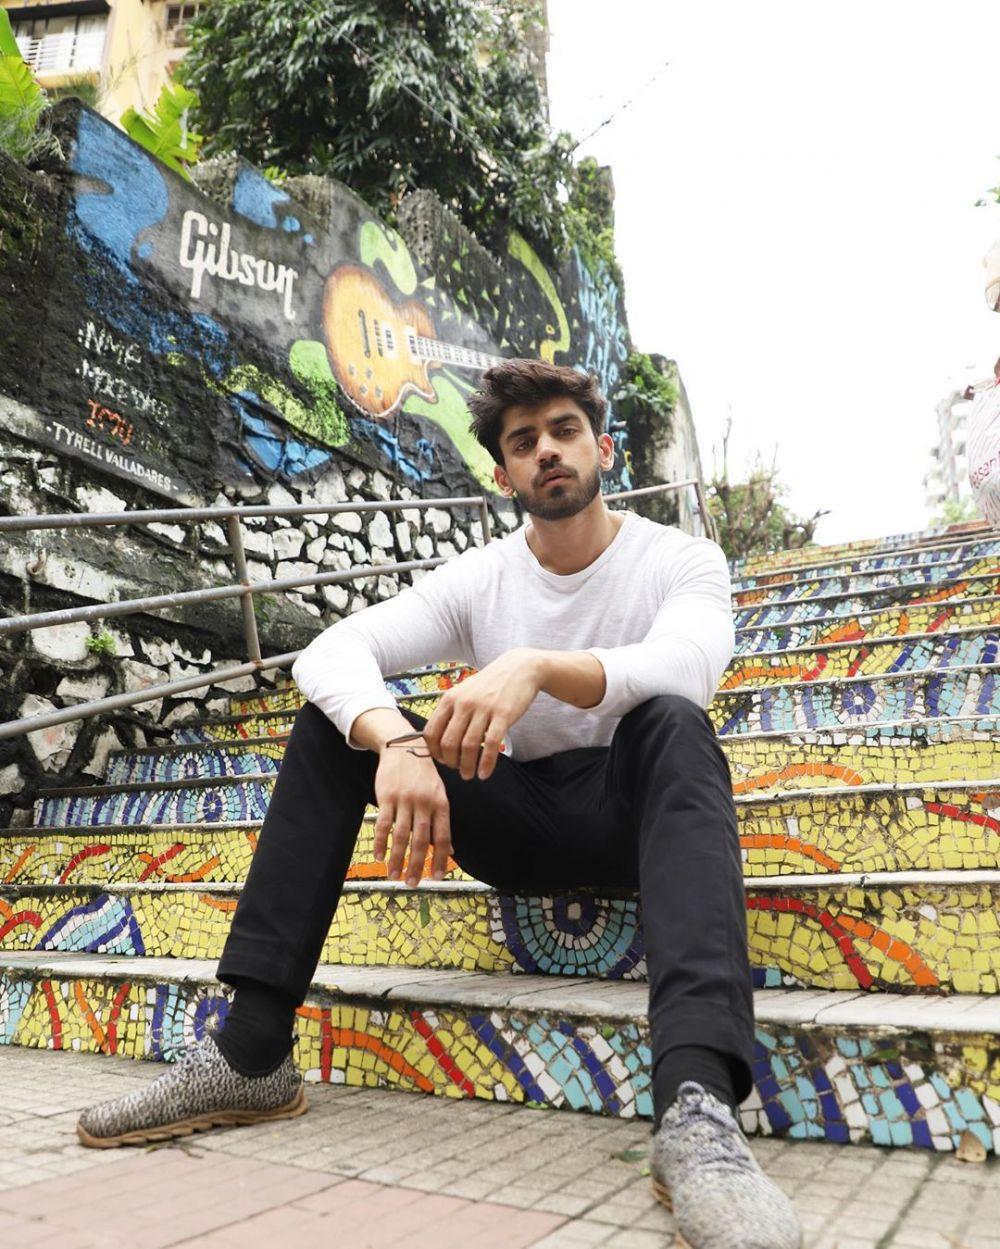 Chic! 9 Inspirasi Style Macho ala Aktor Bollywood Avinash Mishra